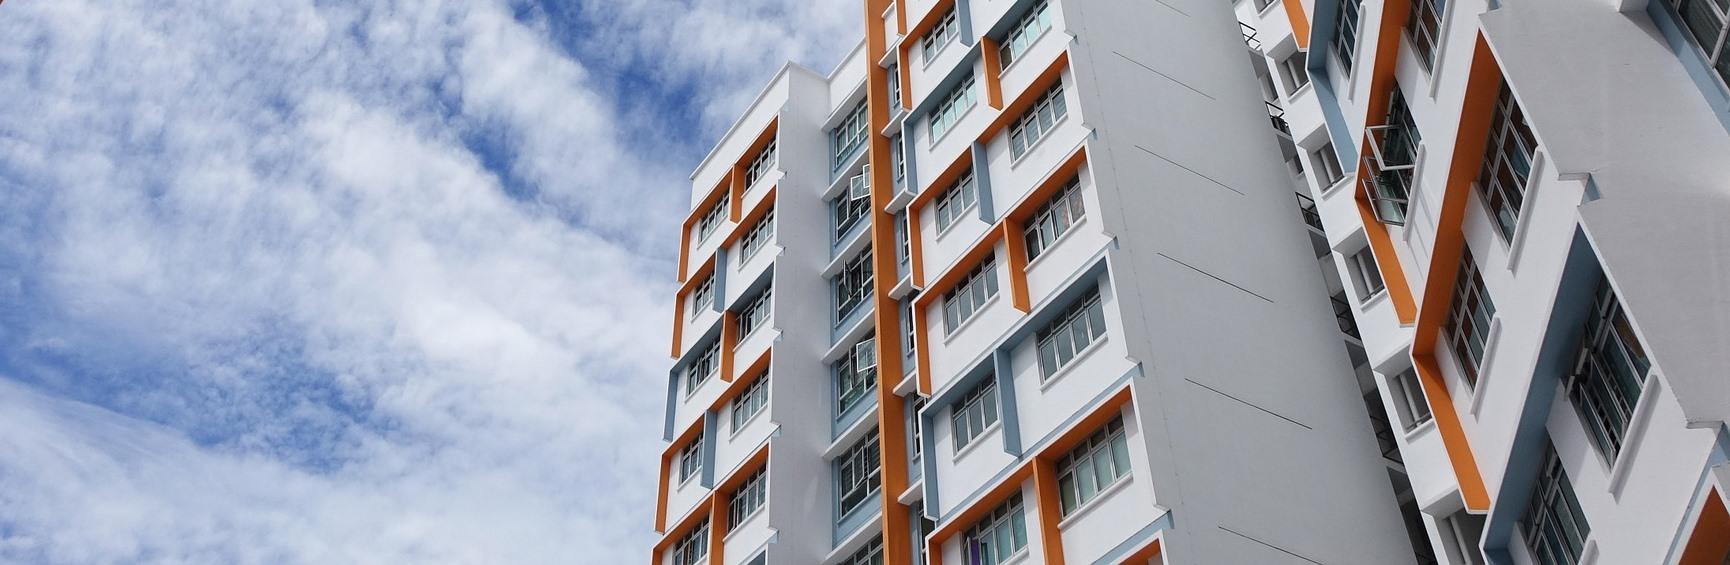 building-807799_1920-pastatai-1